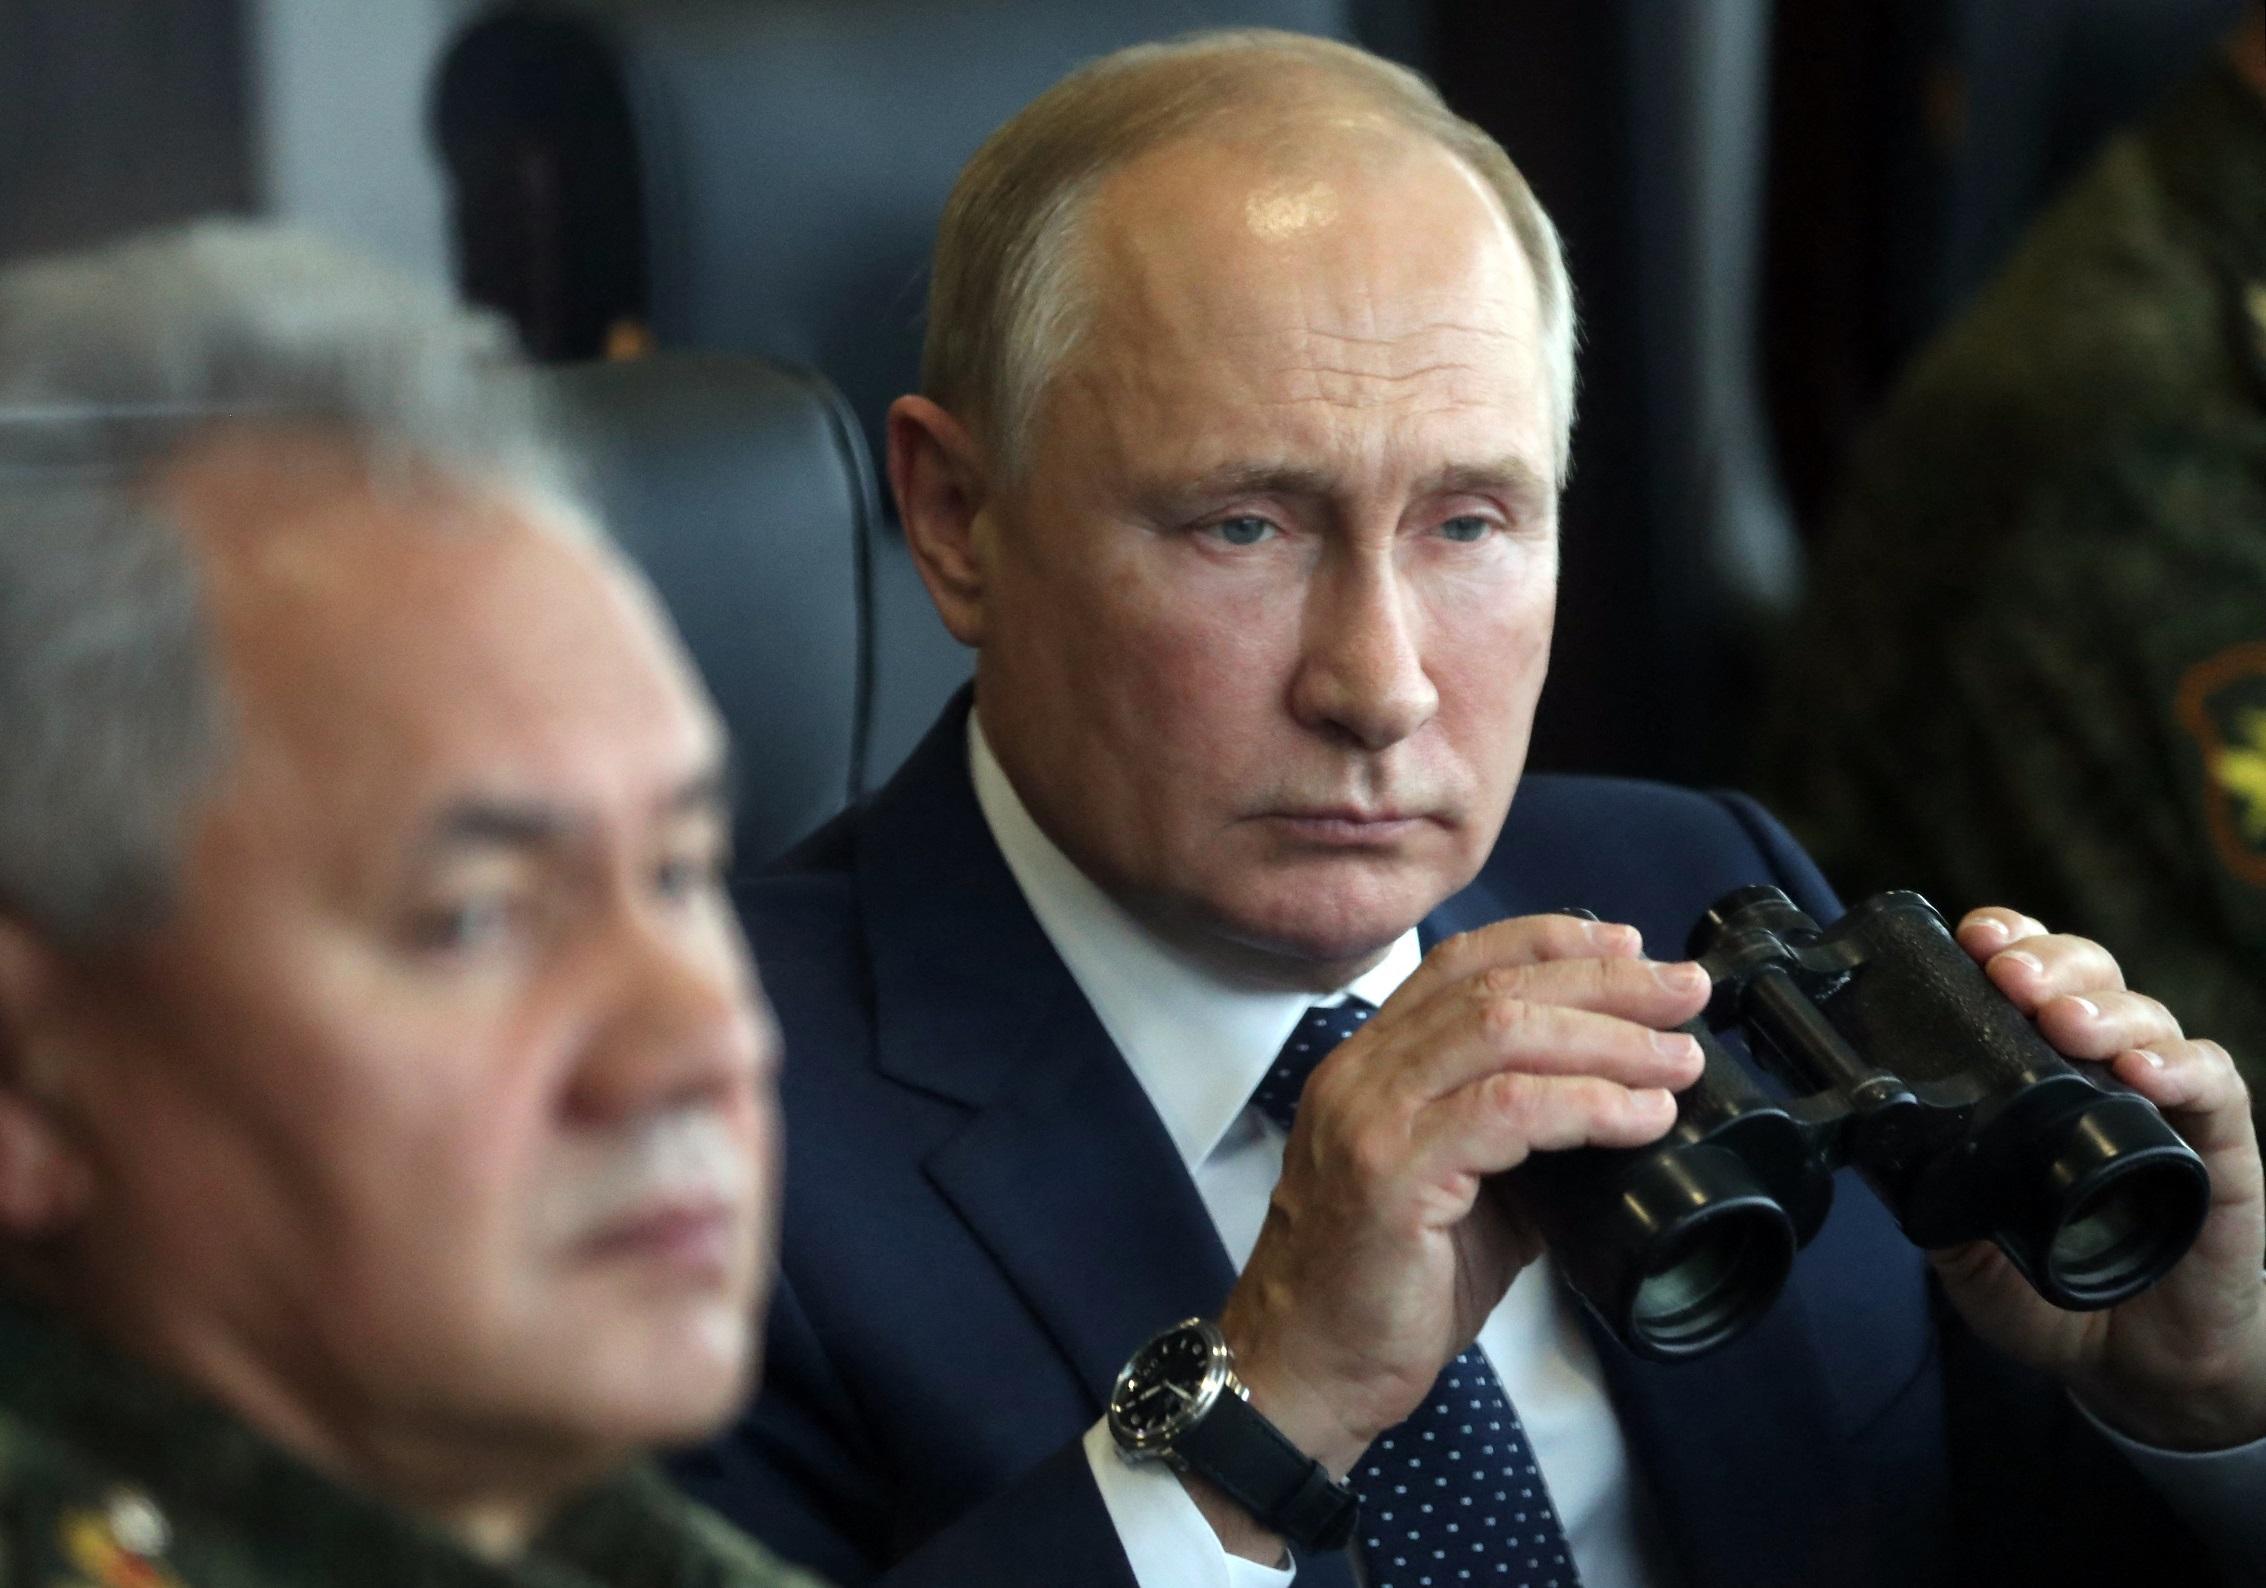 Harci robotokat mutattak be Putyinnak a Zapad-2021 orosz-fehérorosz hadgyakorlaton